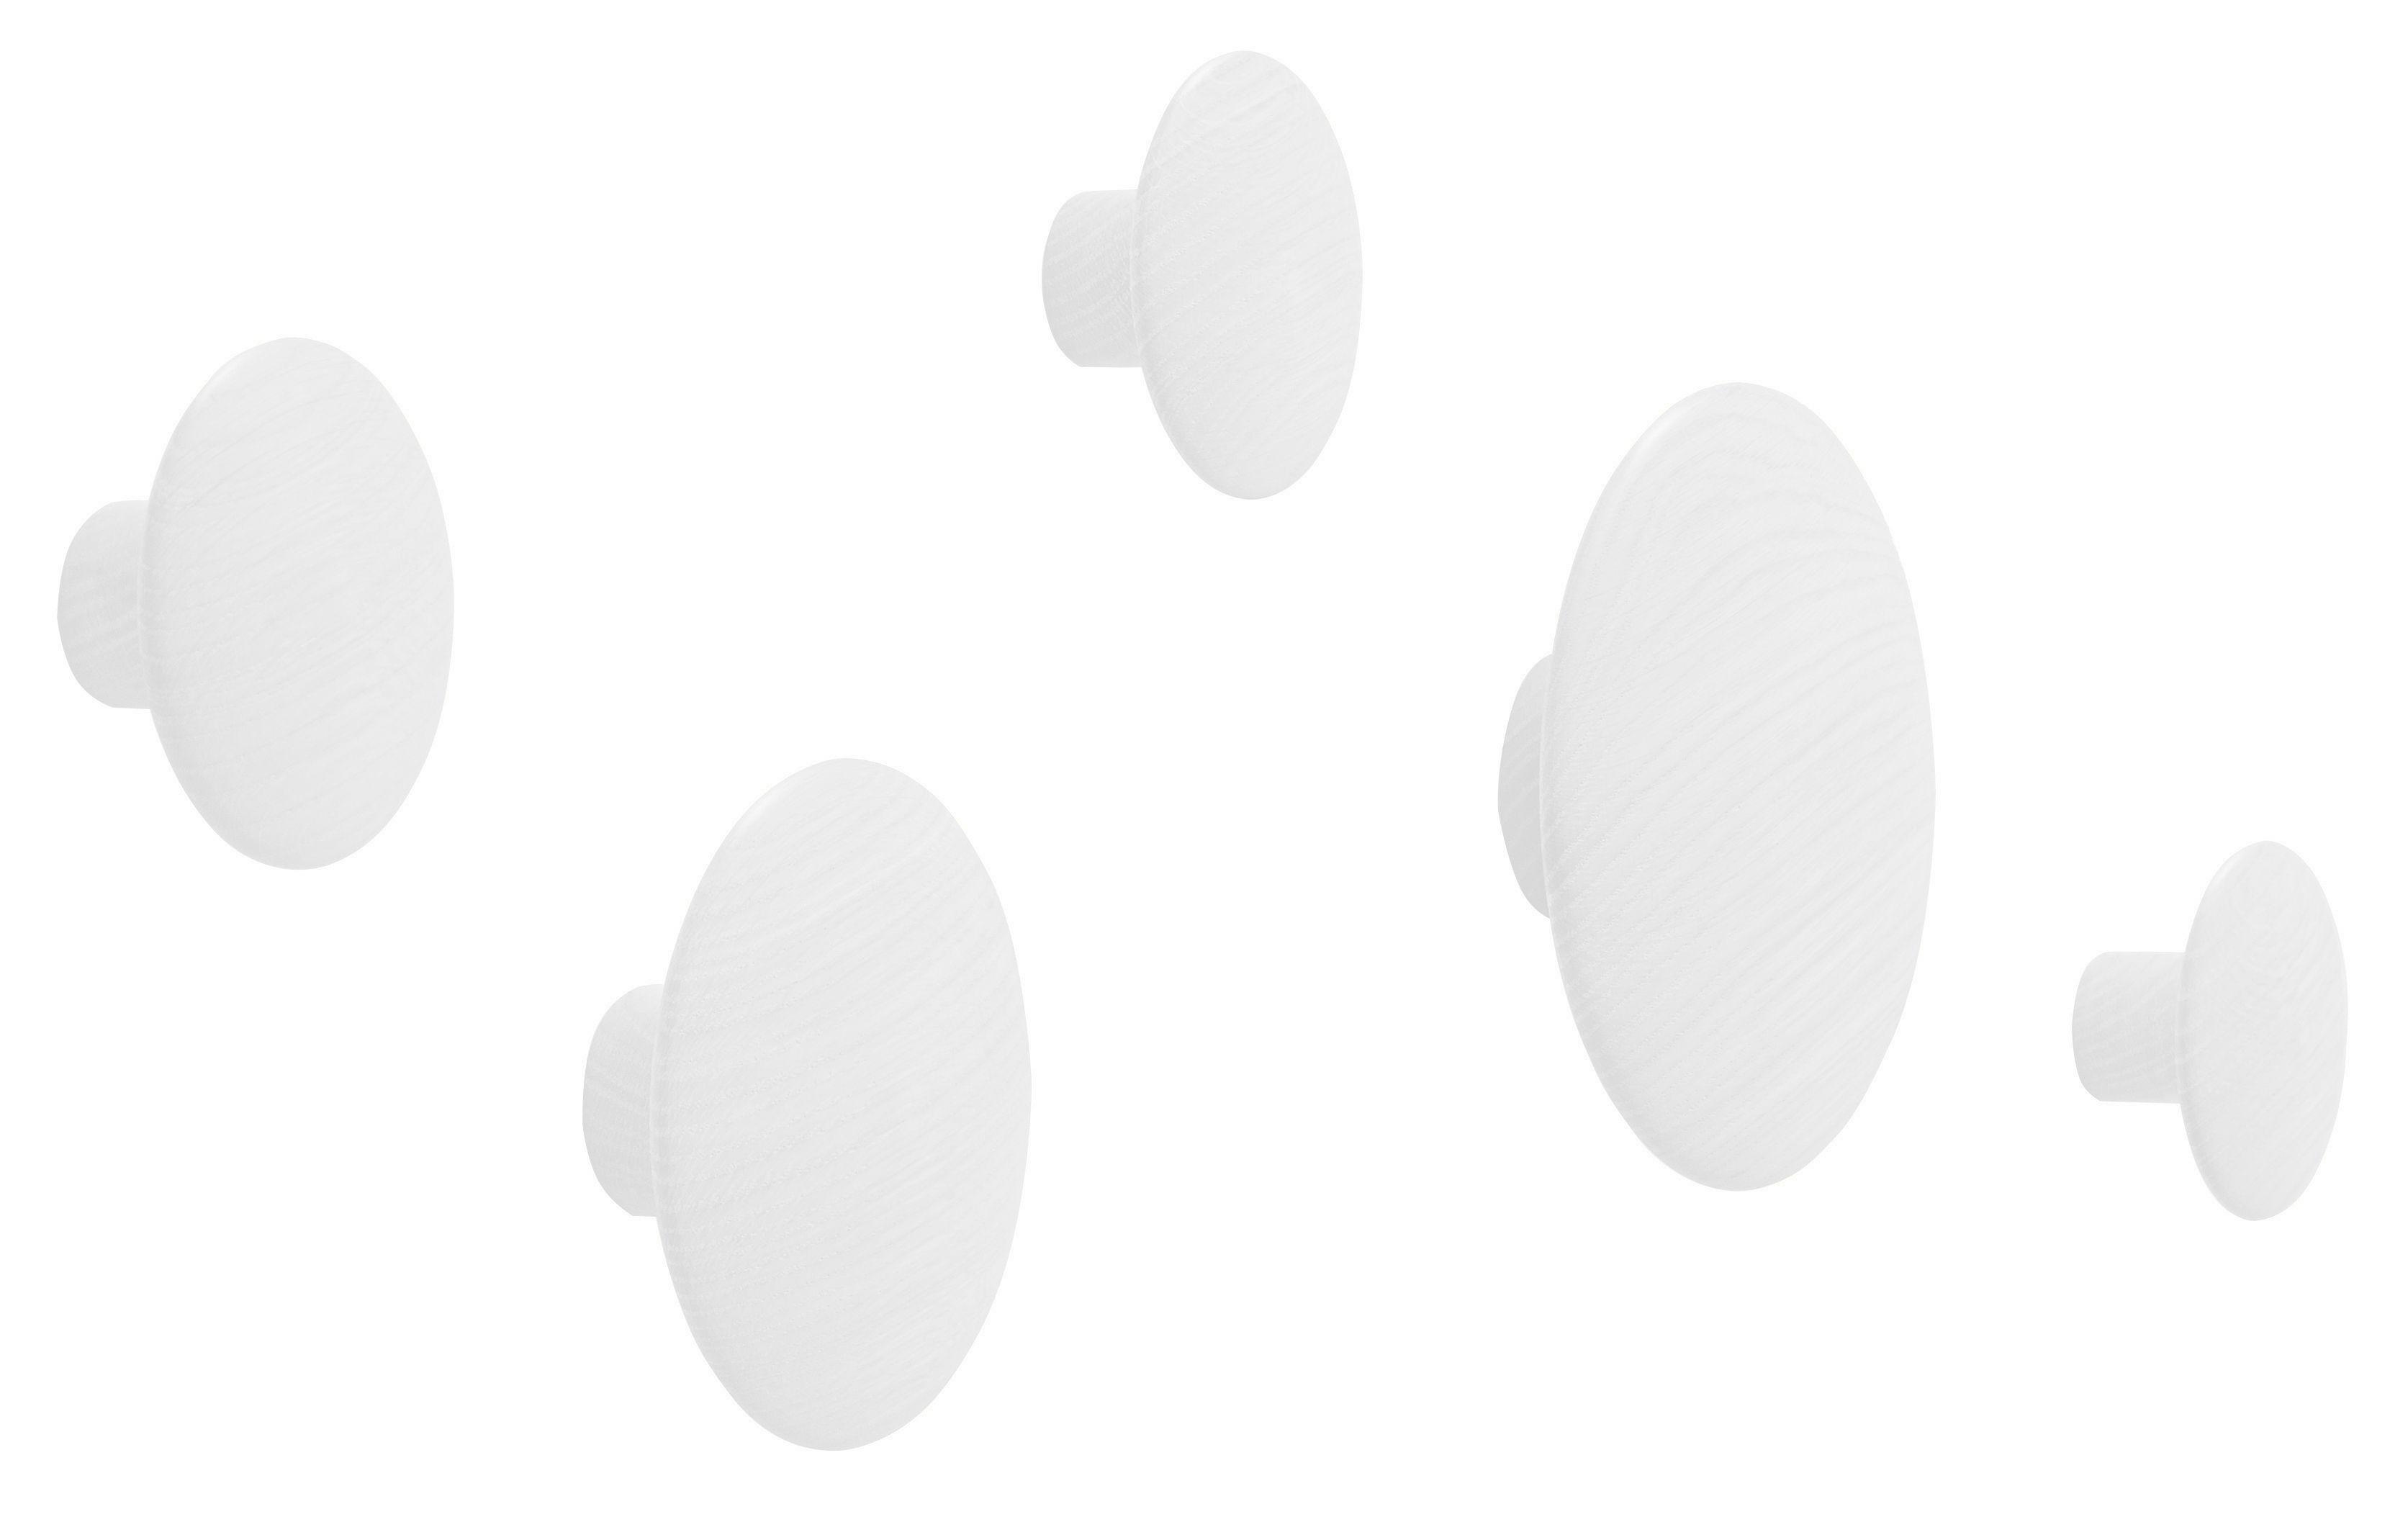 Furniture - Coat Racks & Pegs - The Dots Wood Hook - Set of 5 by Muuto - White - Painted ashwoodwood